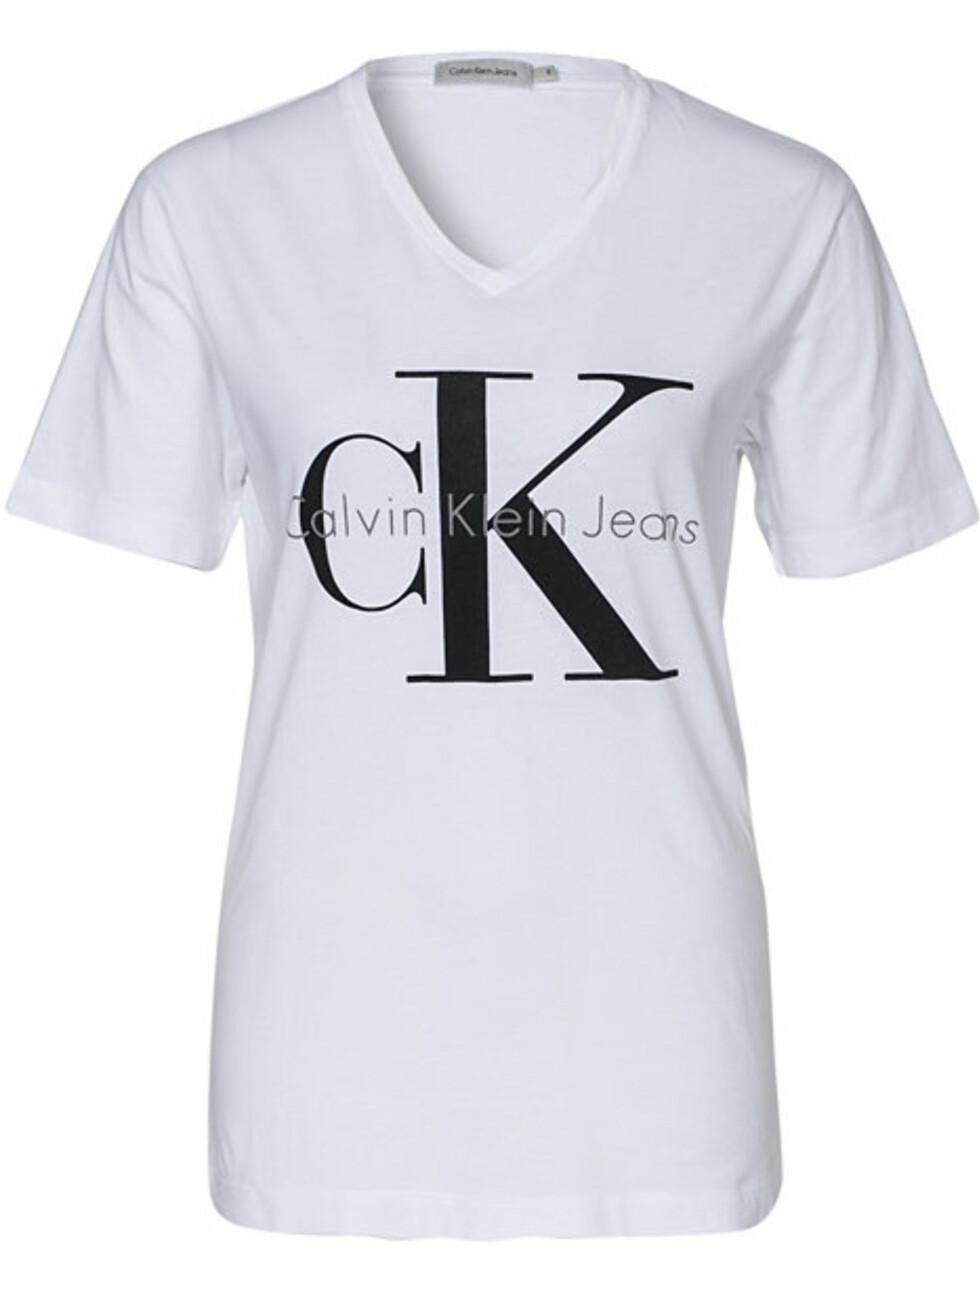 T-skjorte fra Calvin Klein Jeans via Nelly.com, kr 399. Foto: Nelly.com